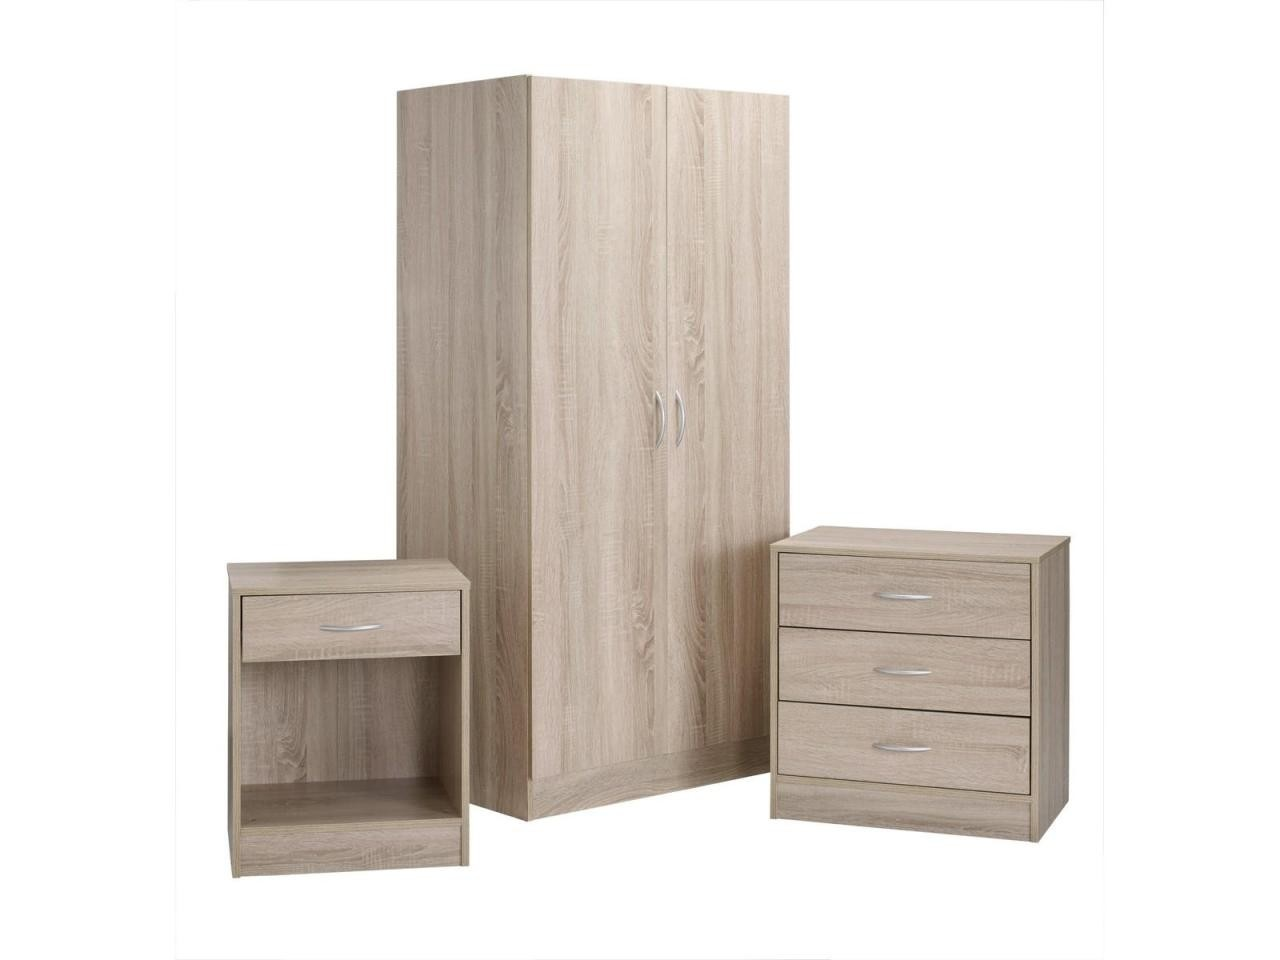 Bedroom Set - Black,White or Oak